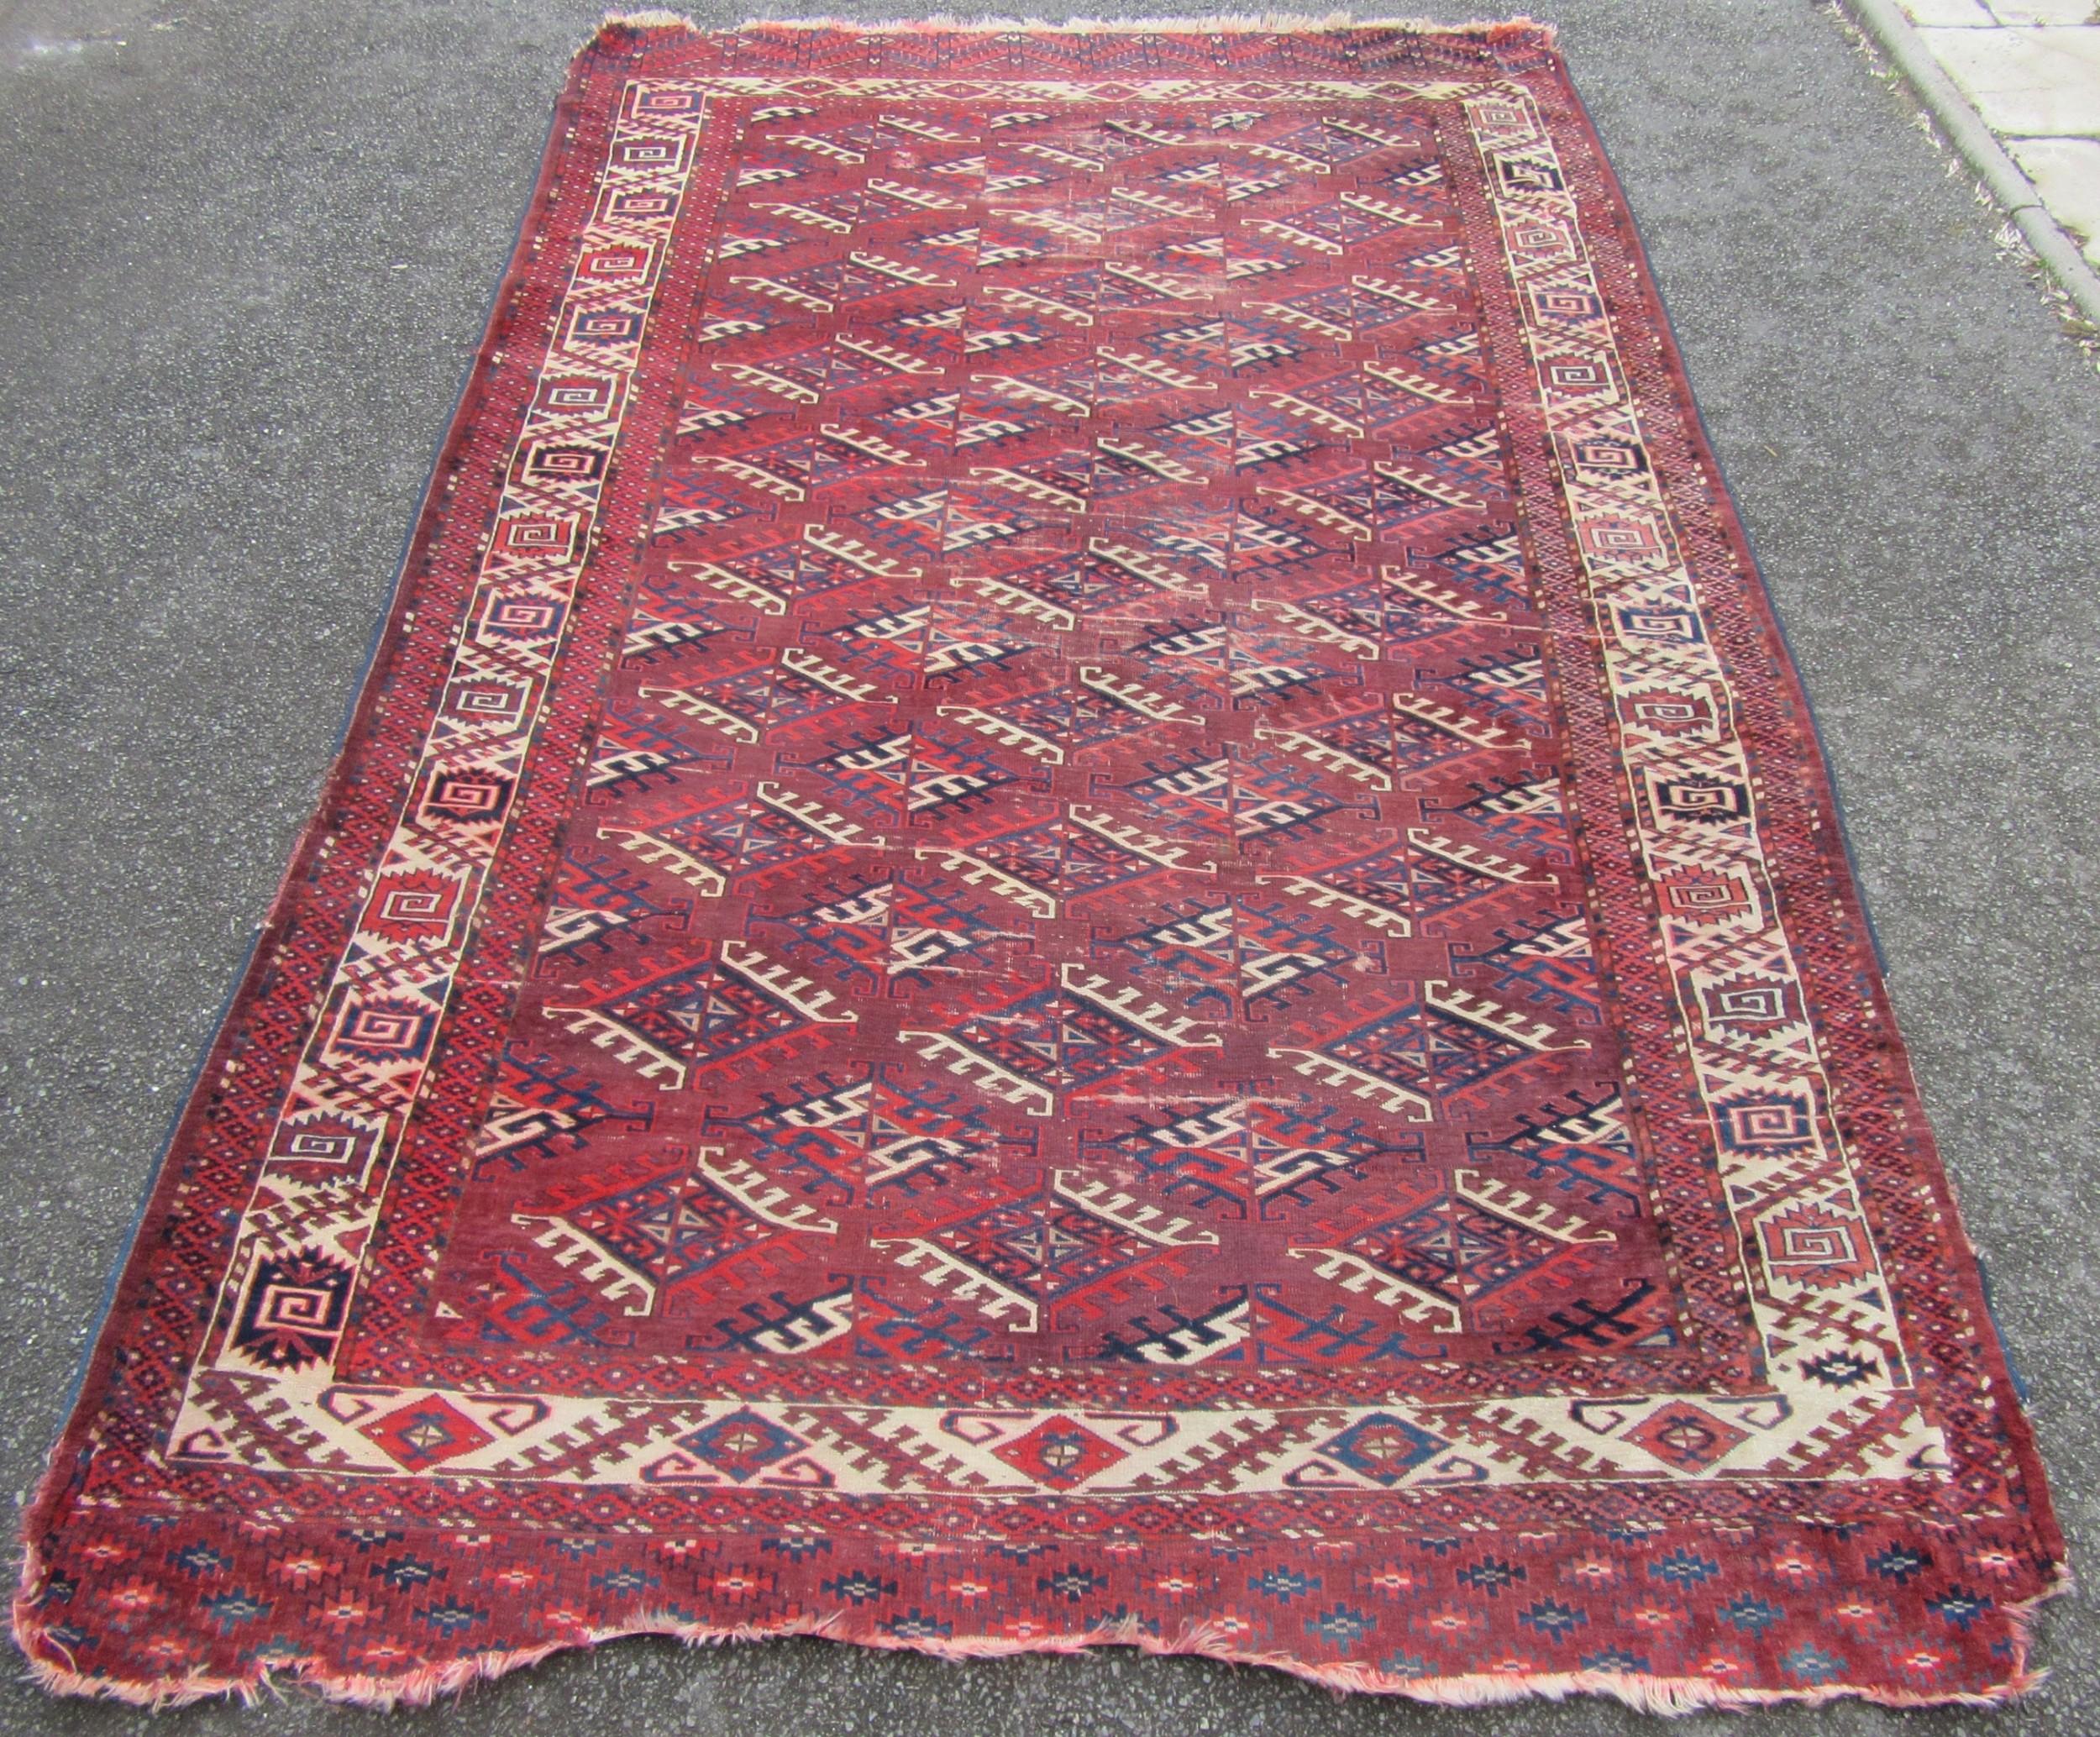 antique country house shabby chic yomut turkoman turkmen dyrnak gul main carpet rug